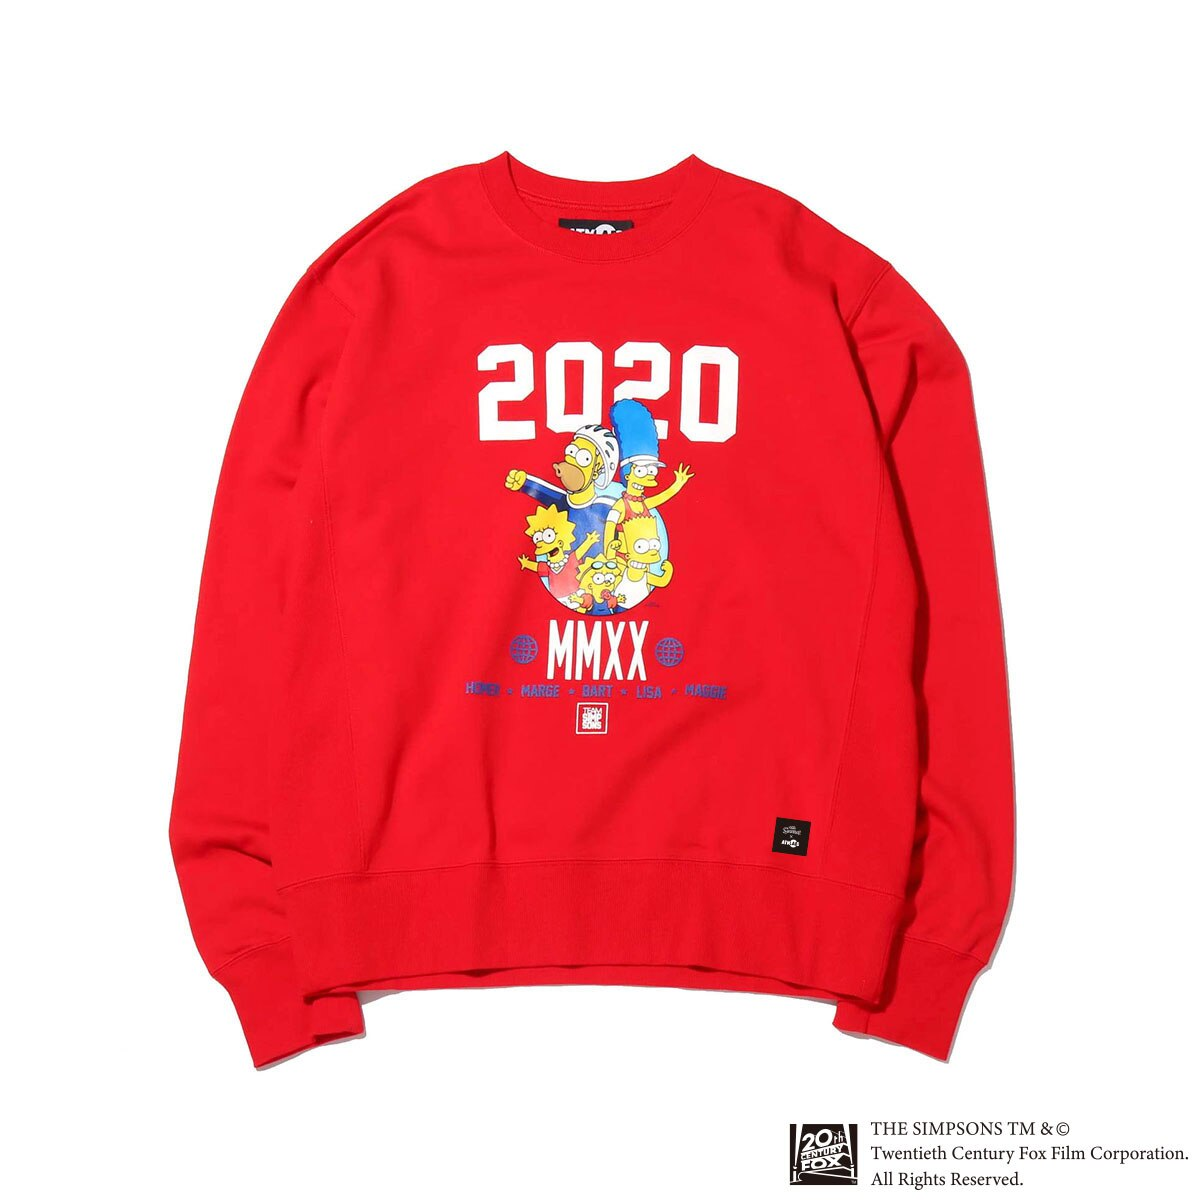 ATMOS LAB x THE SIMPSONS 2020 FAMILY CREW(アトモスラボ ザ シンプソンズ 2020 ファミリー クルー)RED【メンズ スウェット】20SP-S